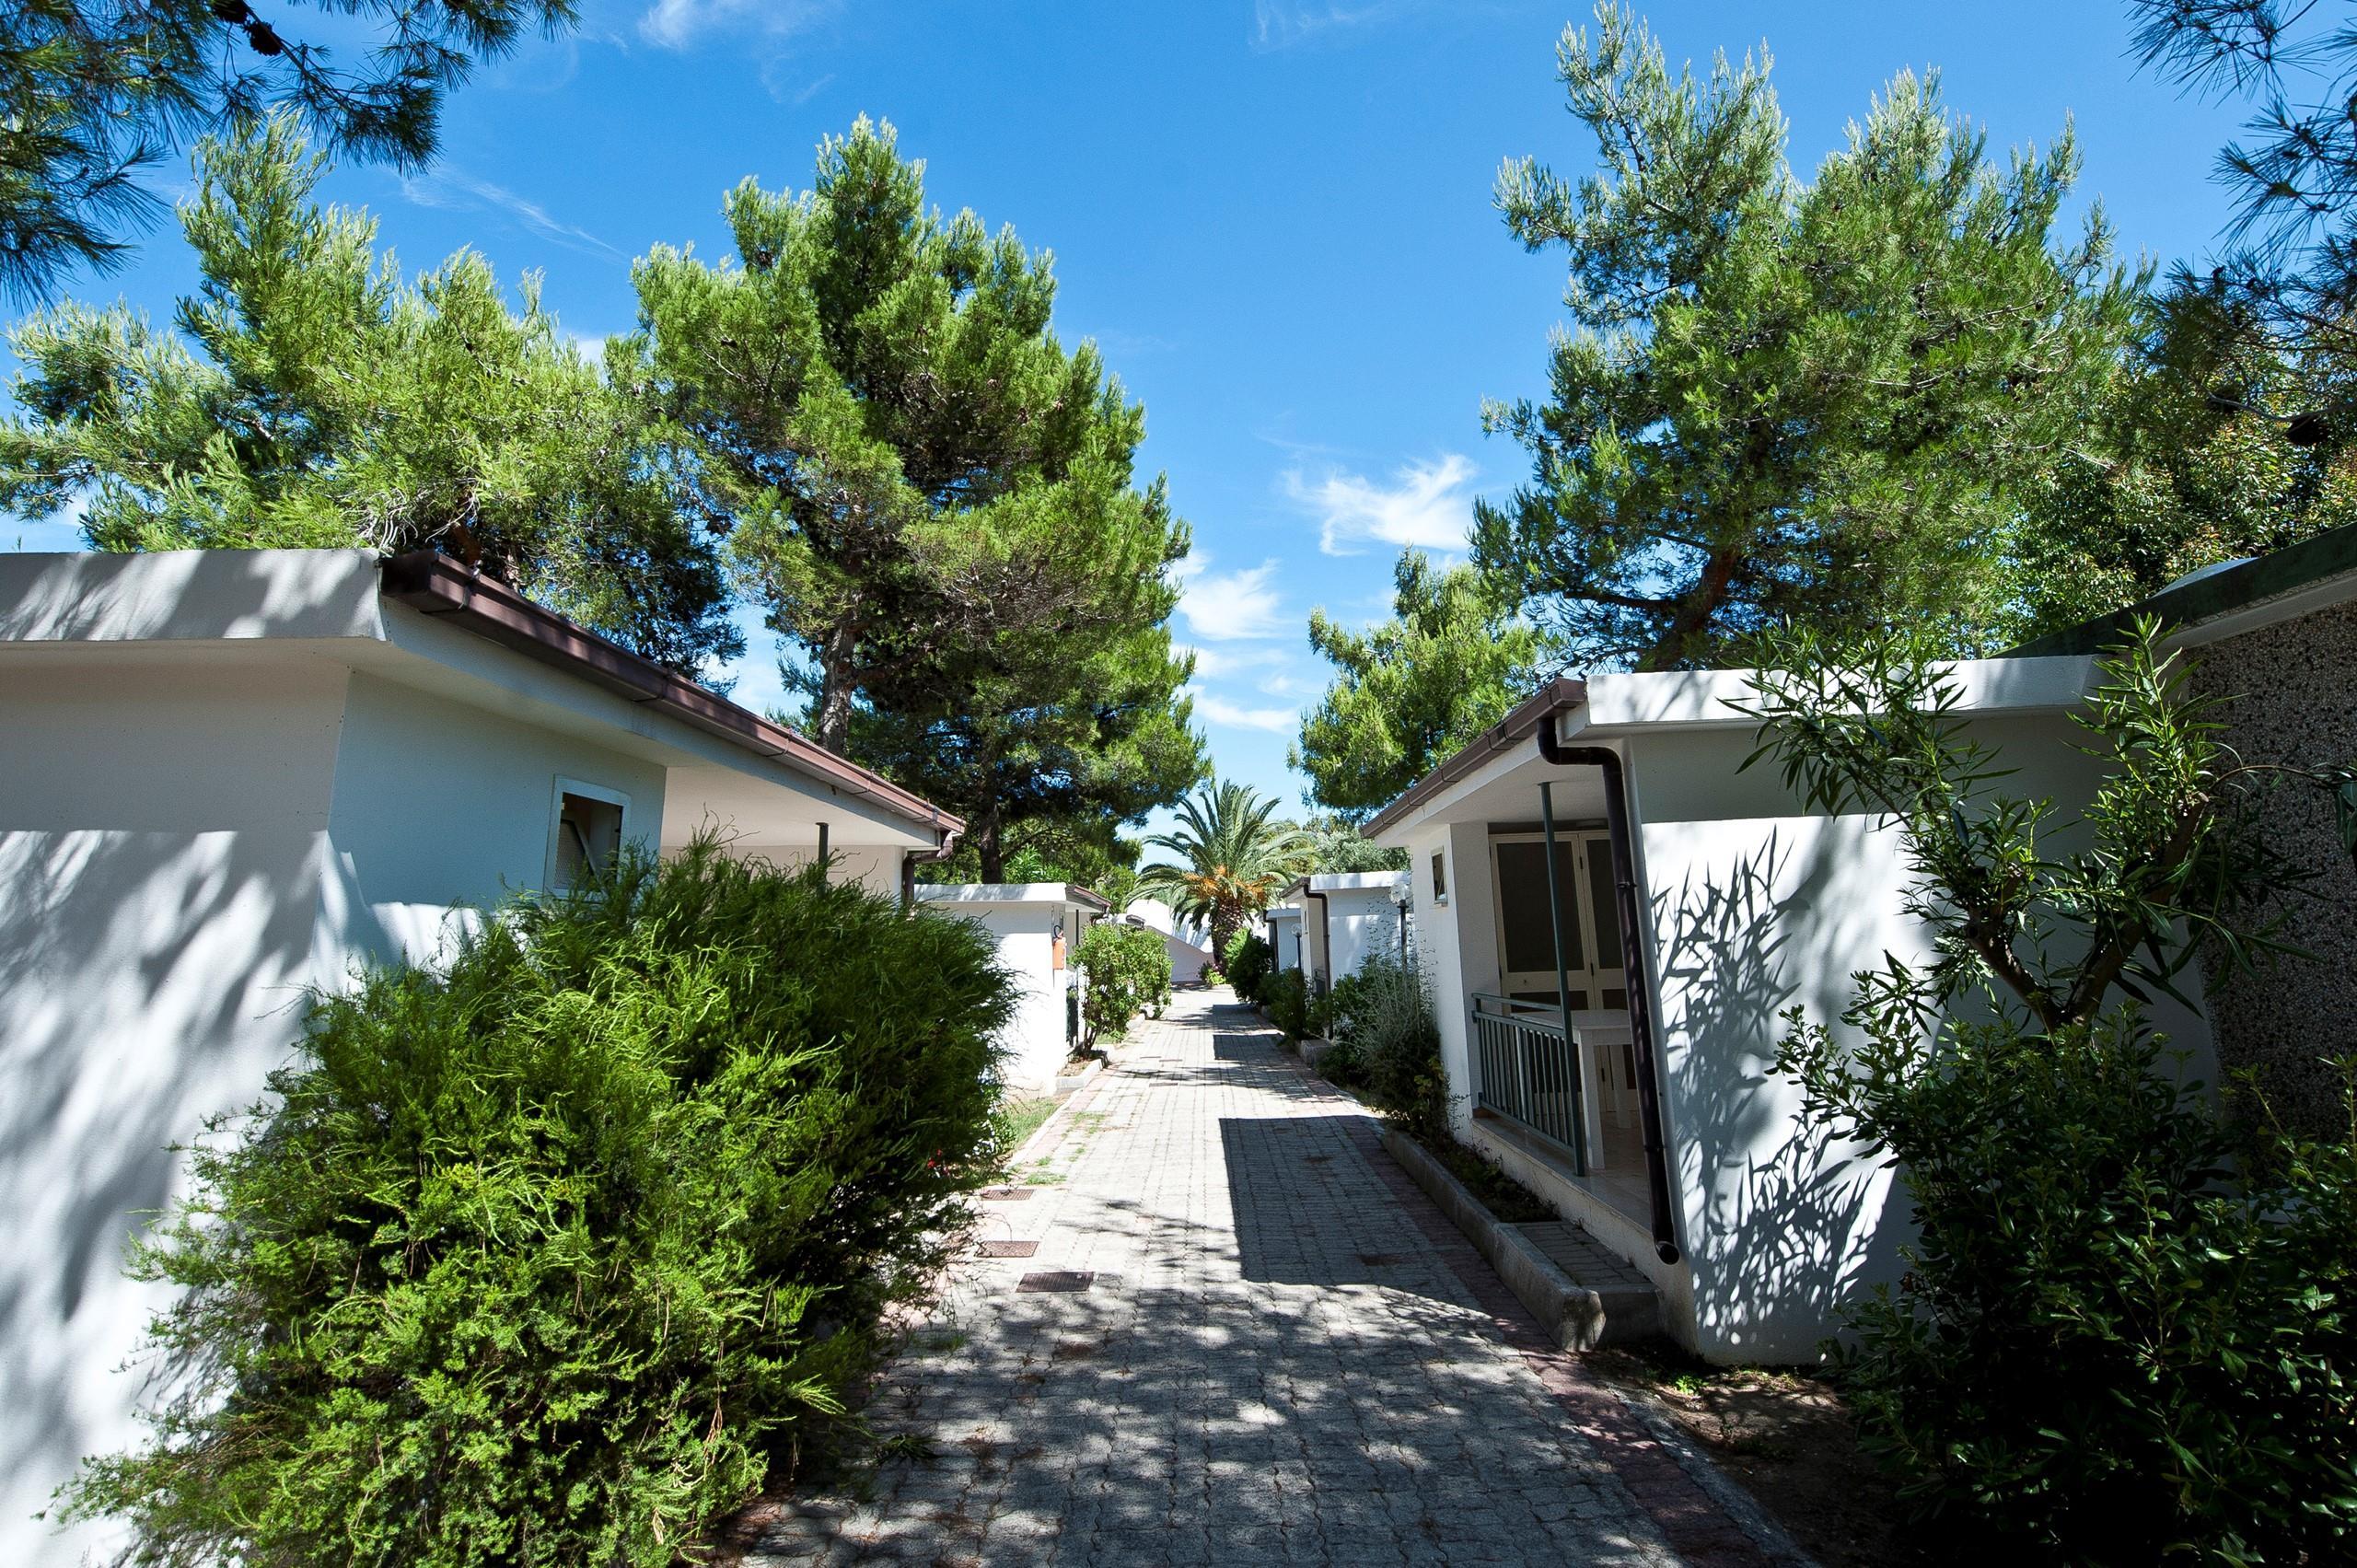 Location - Bungalow 'Corallo' Deux Pièces - Camping Le Diomedee